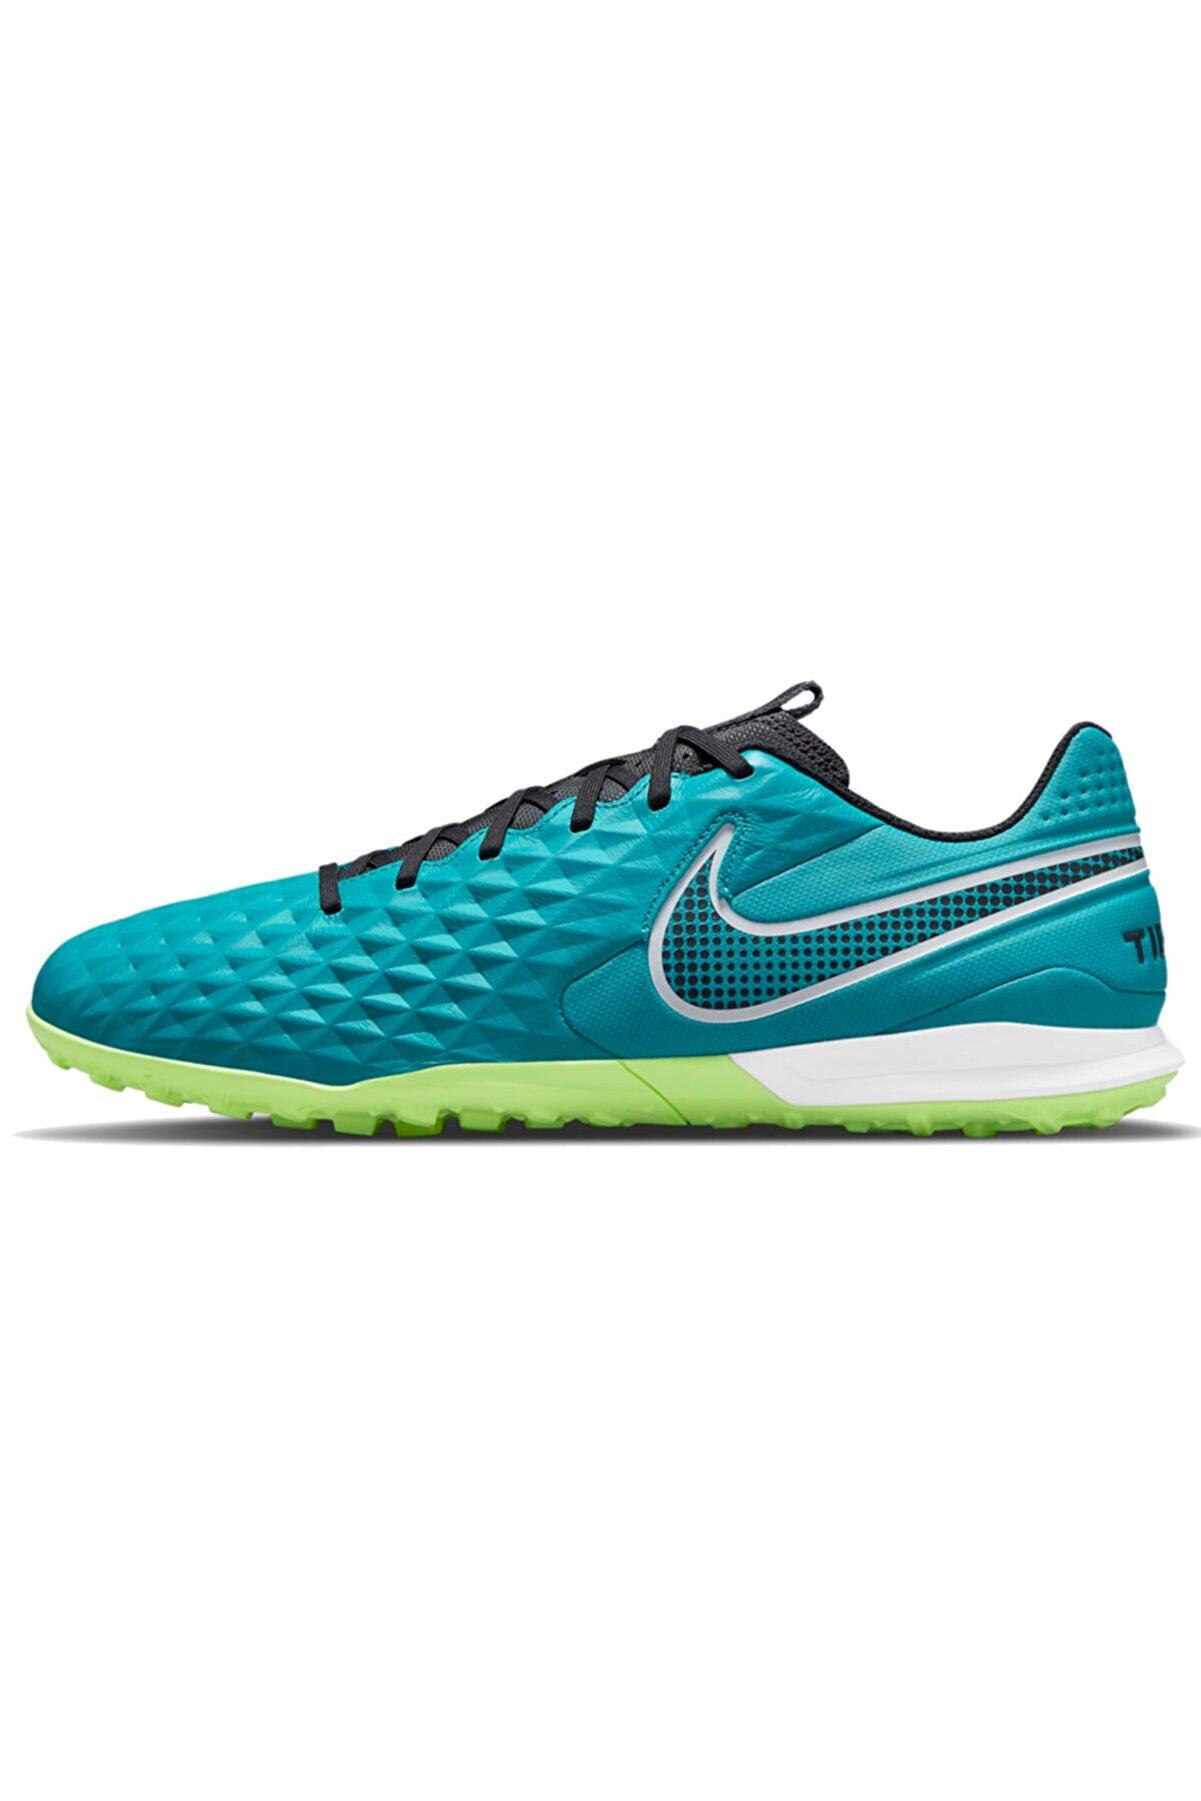 Nike At6100-303 Legend 8 Academy Tf Unisex Futbol Ayakkabı